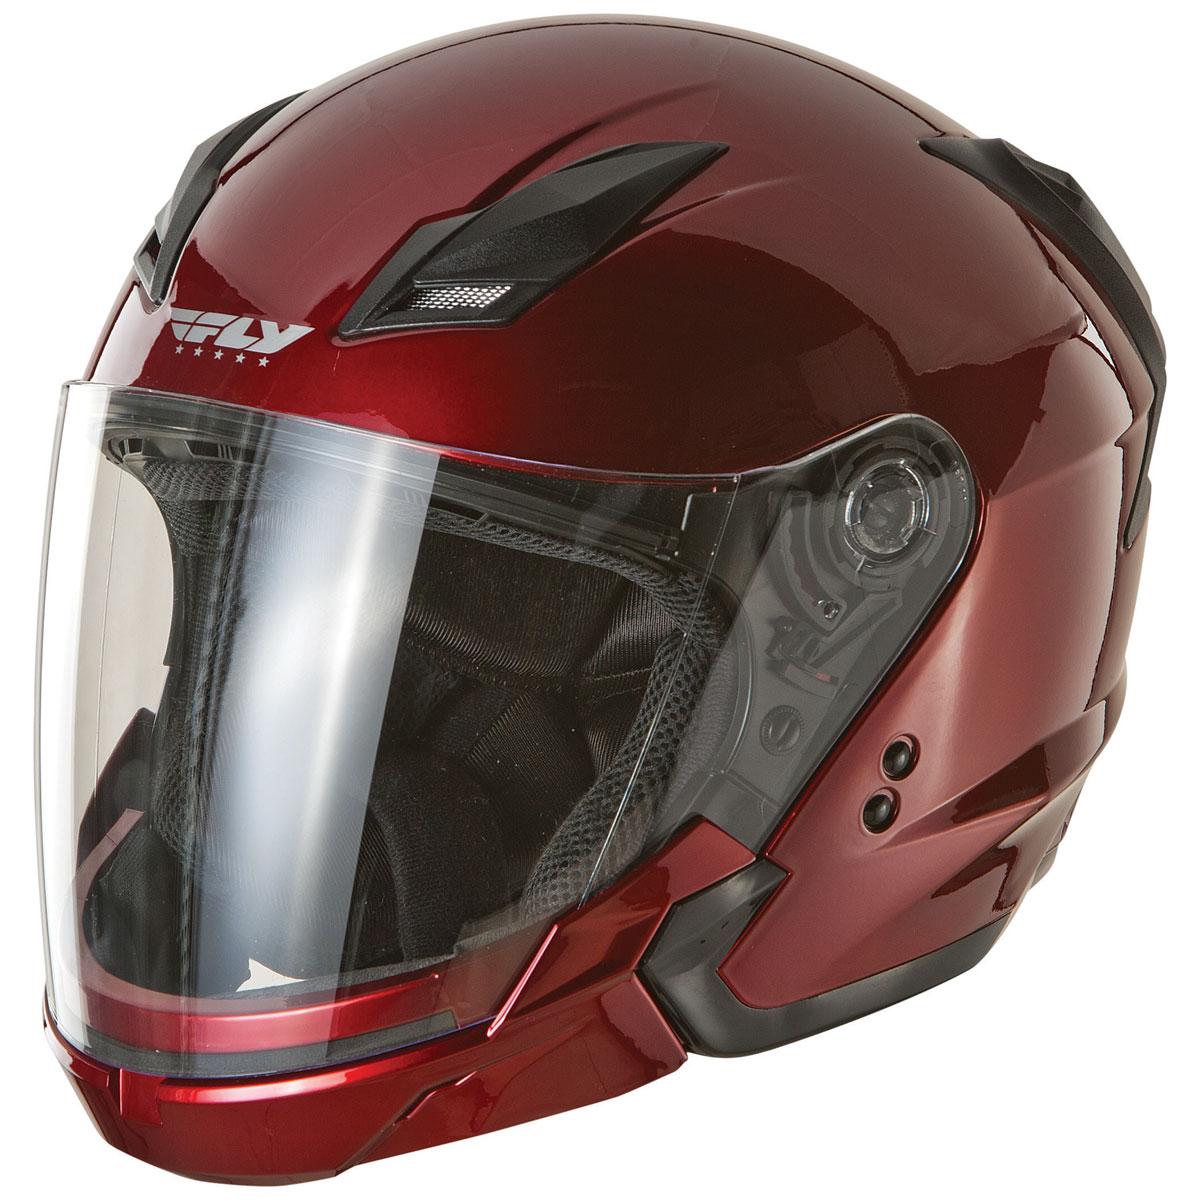 FLY Racing Street Tourist Candy Red Modular Helmet